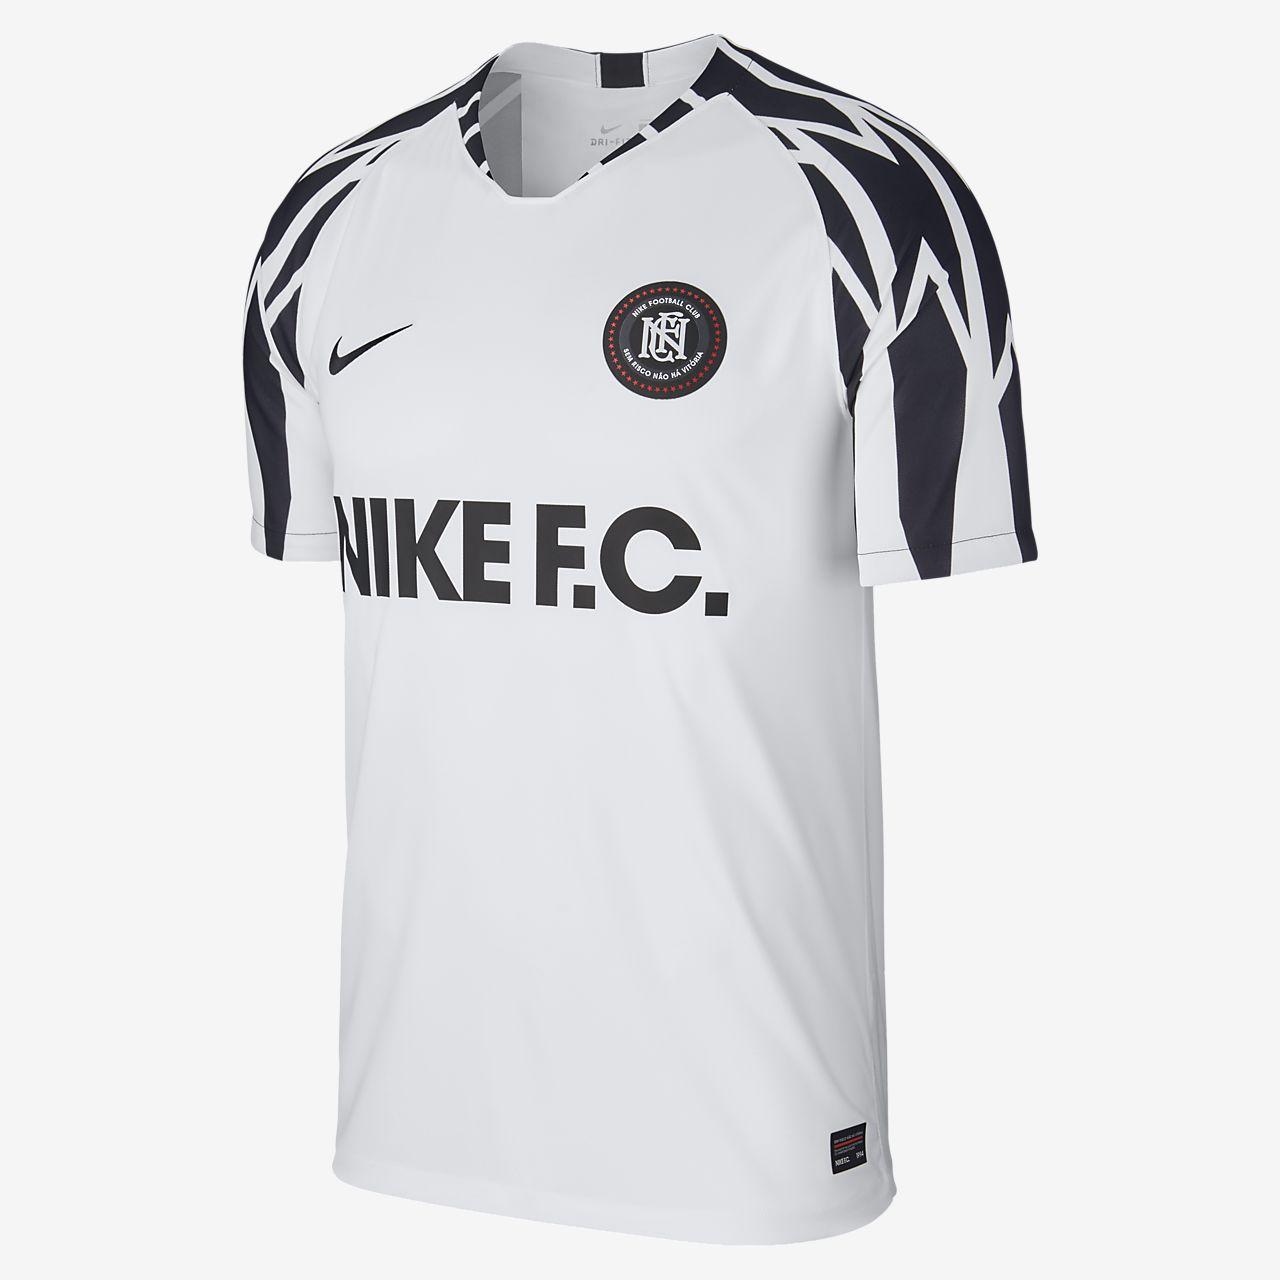 914484b9 Nike F.C. Men's Football Shirt. Nike.com ZA